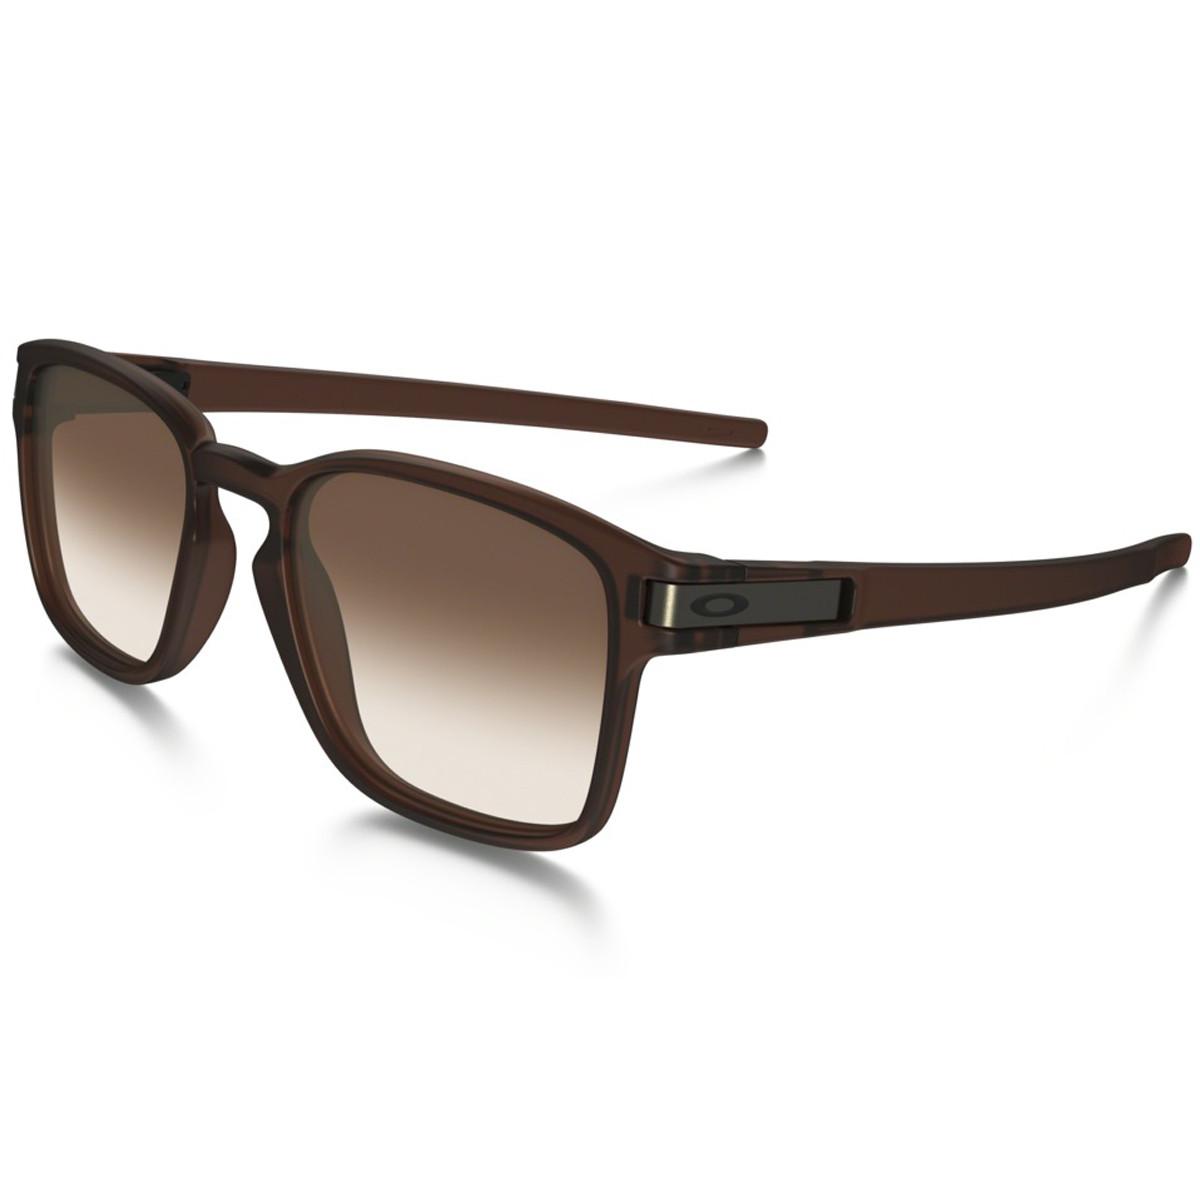 5deecdf221faf Óculos Oakley Latch Square Matte Rootbeer Lente Dark Brown Gradient ...